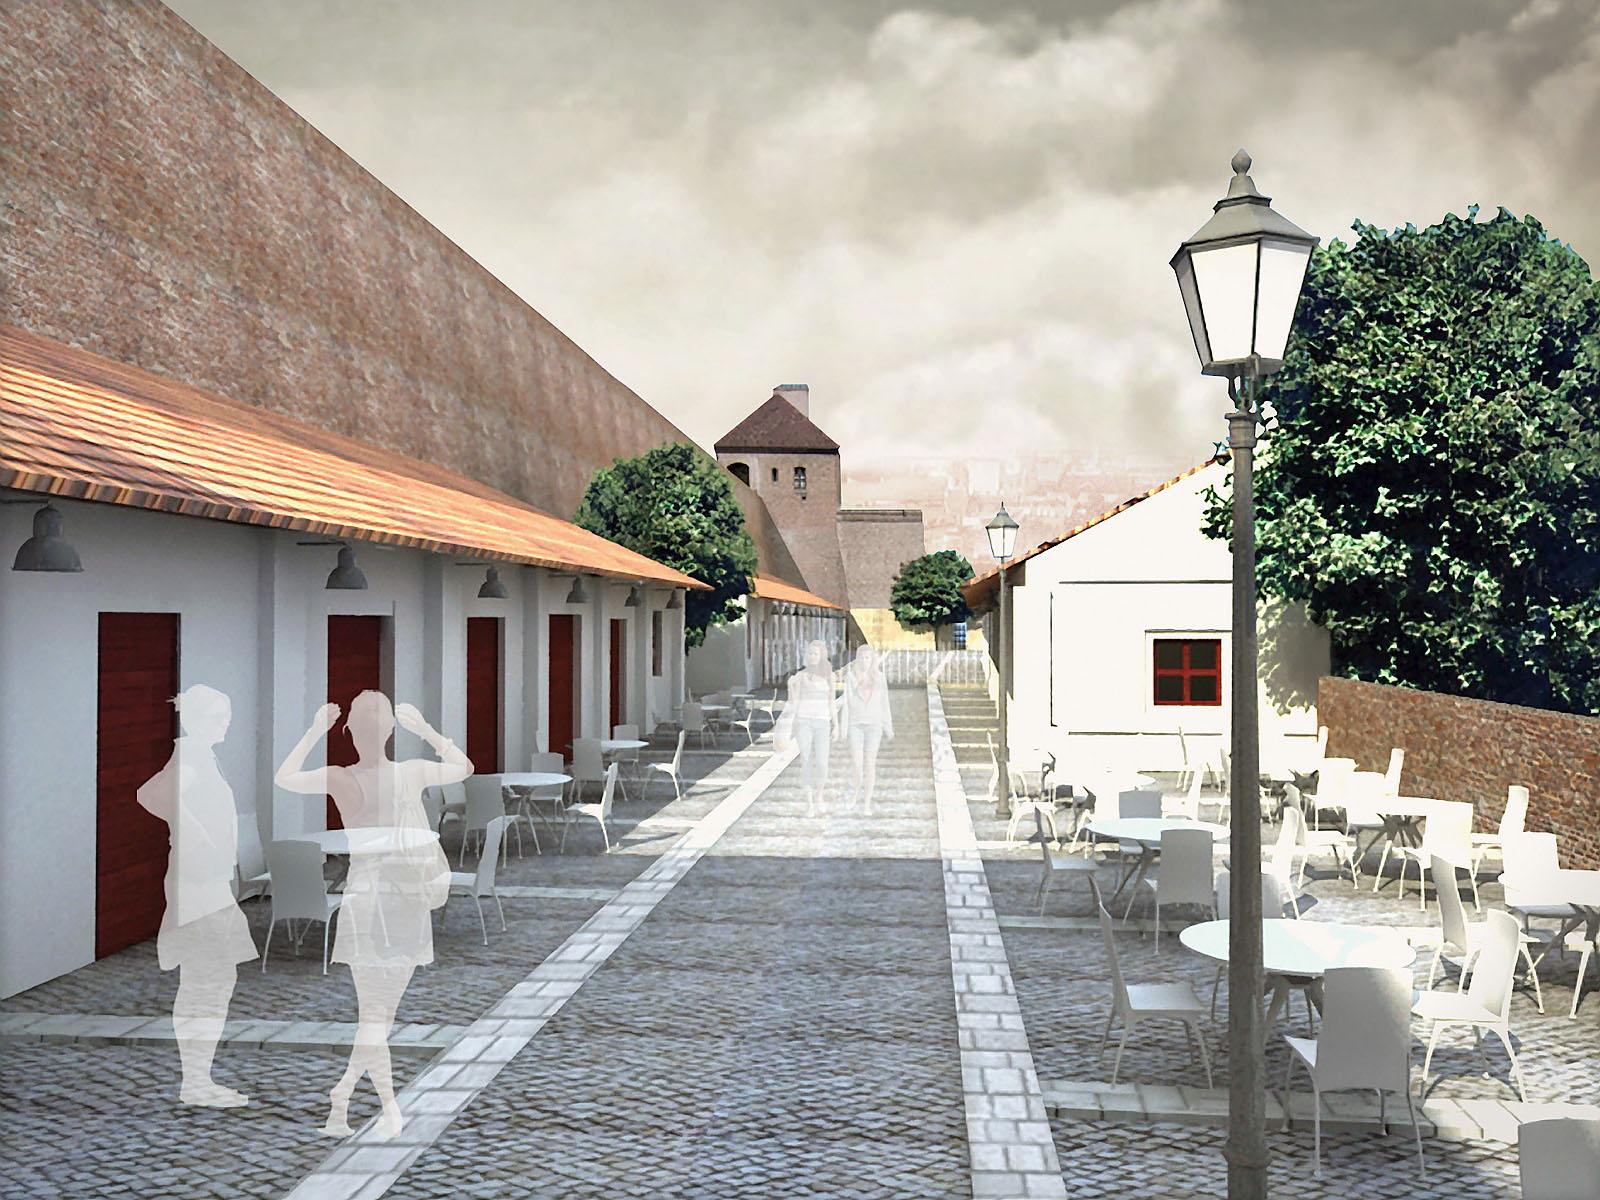 rekonstrukce hradu Špilberk | Brno | 16